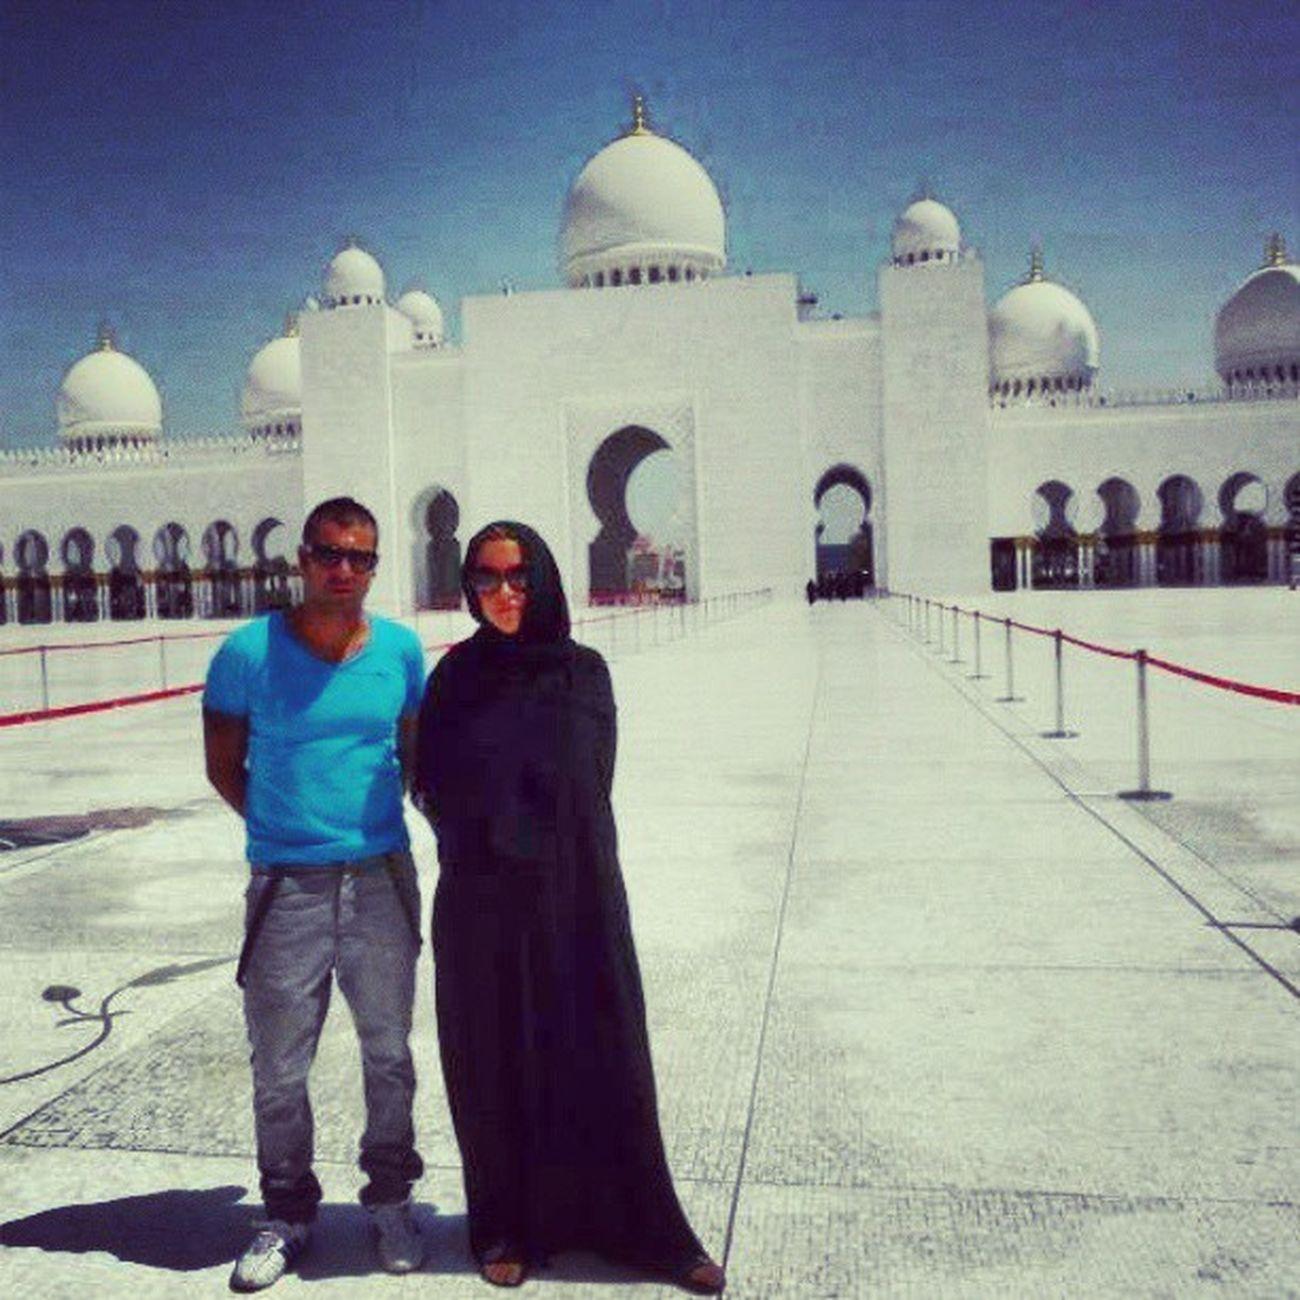 Mosk of Abu dhabi Abudabhi Emirates Mosk Instagram Instamoments Instagrameando Viajedenovios